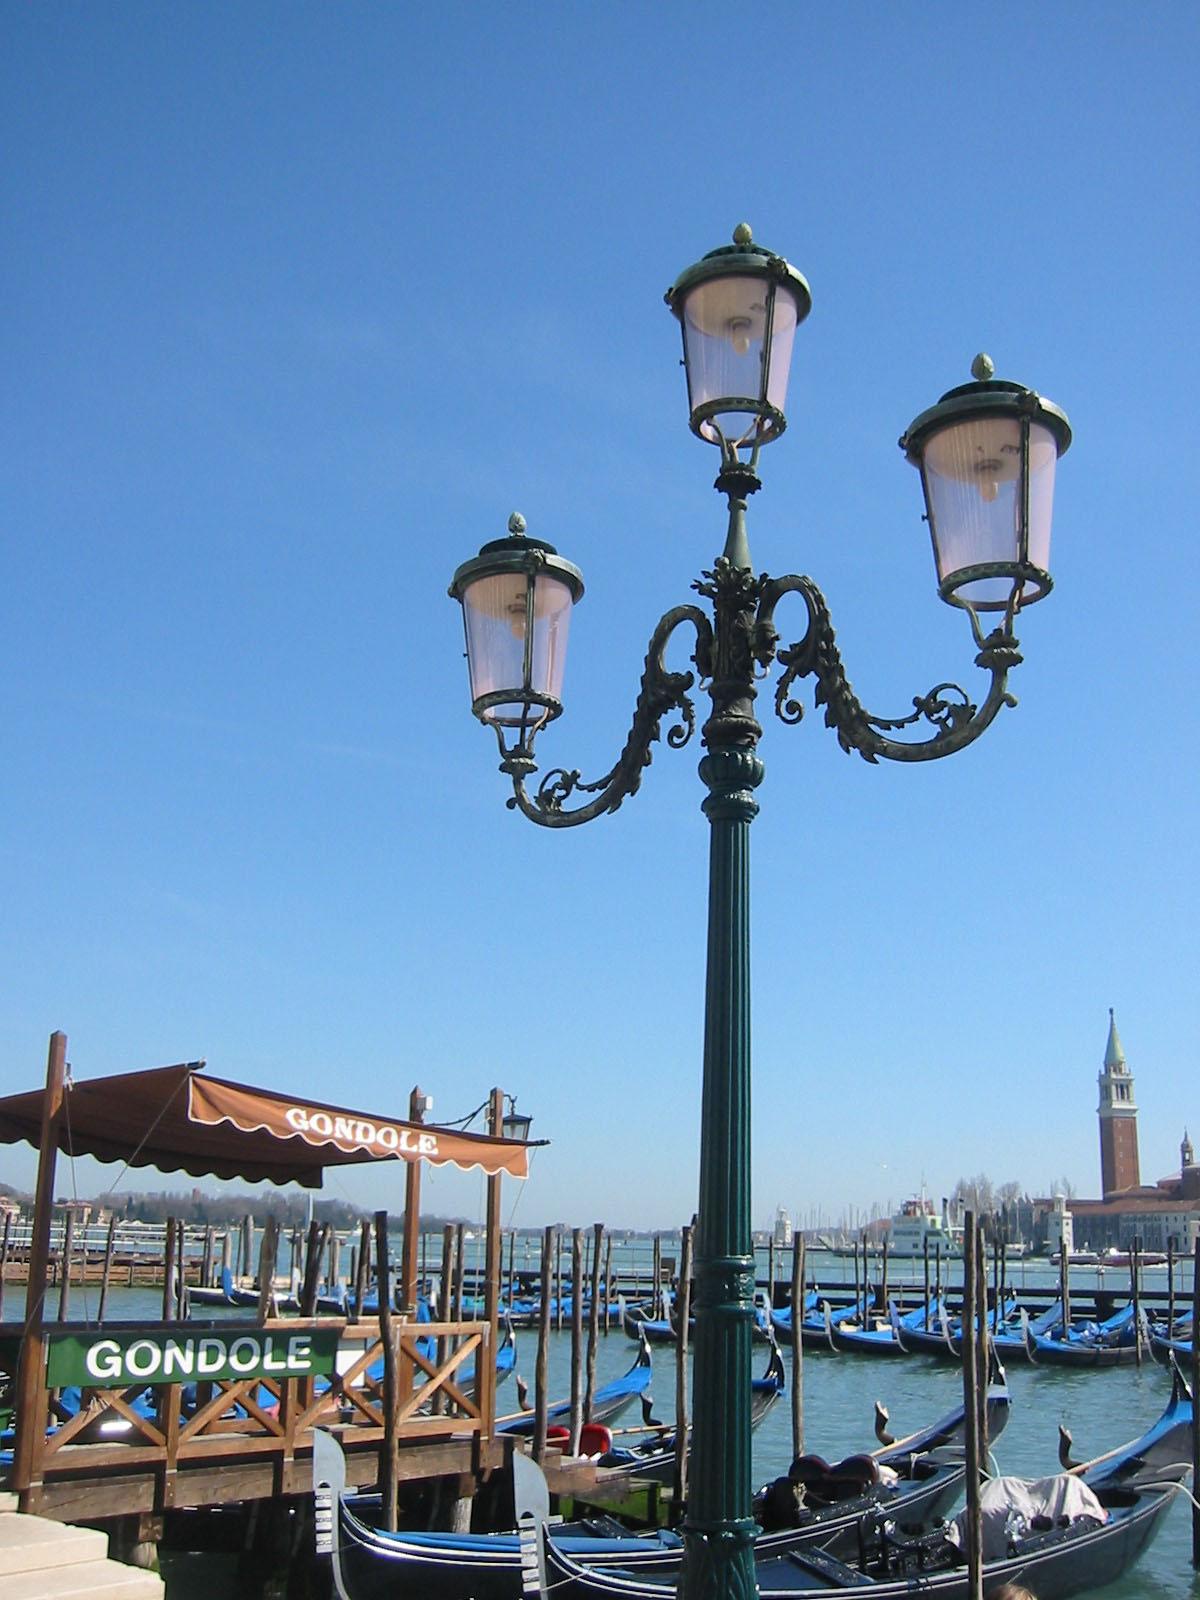 200603a29 06 Lamppost Venice